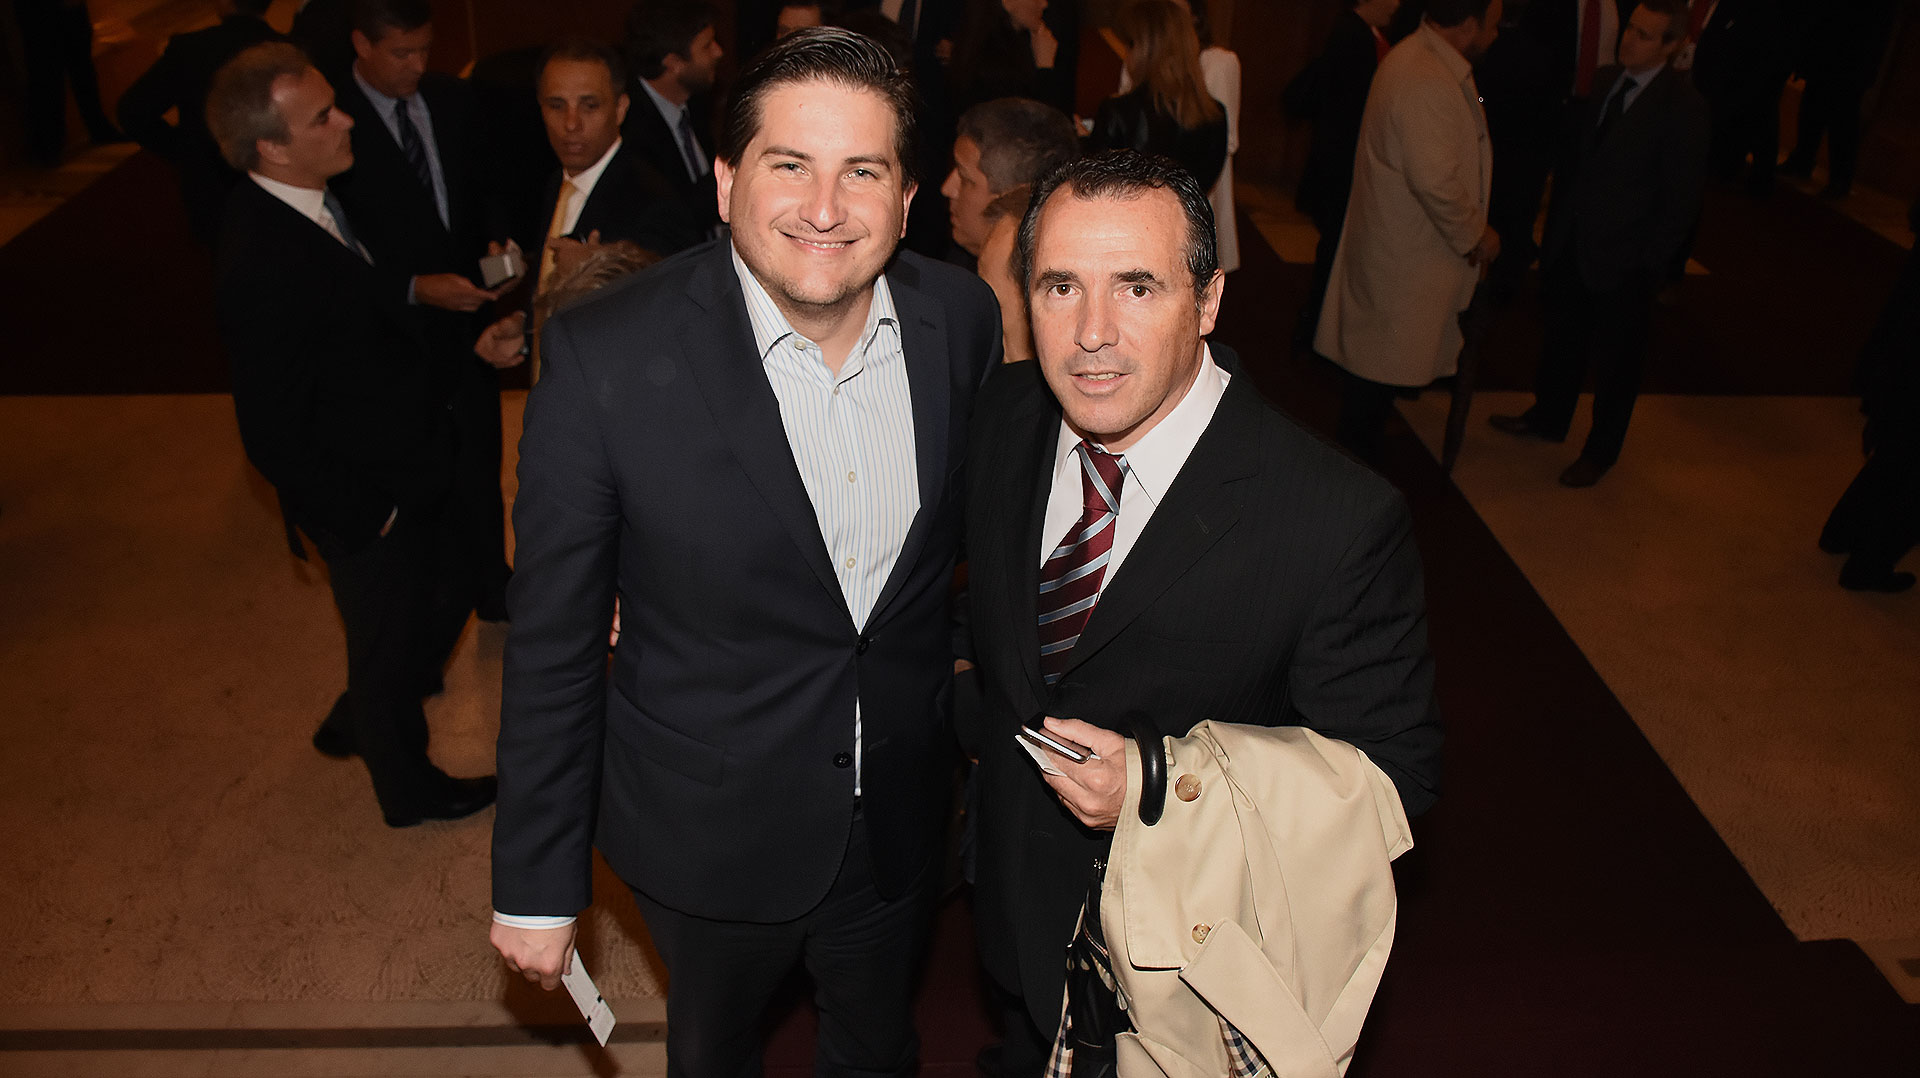 Gastón Corral, director HSBC Argentina con Ezequiel Barrenechea